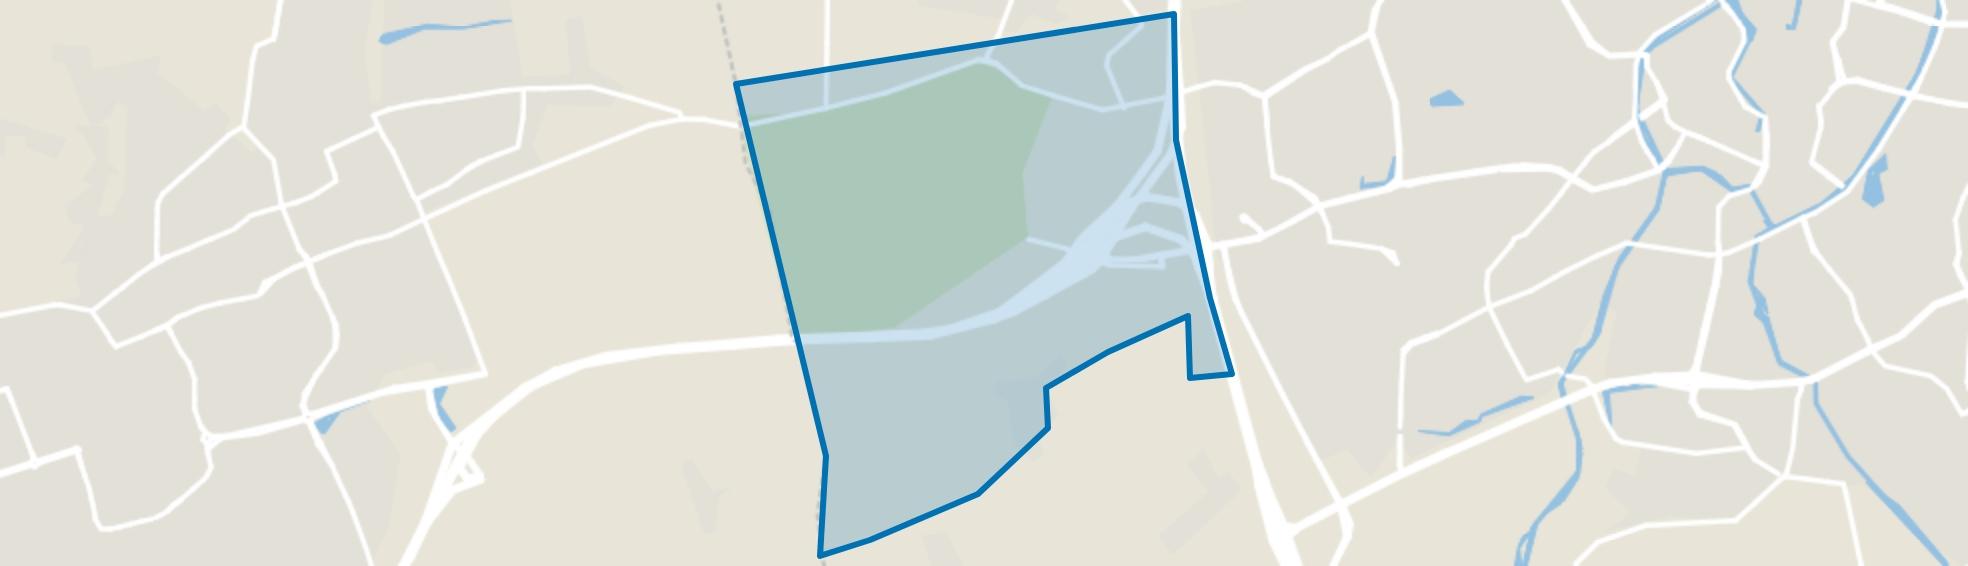 Liesbos, Breda map